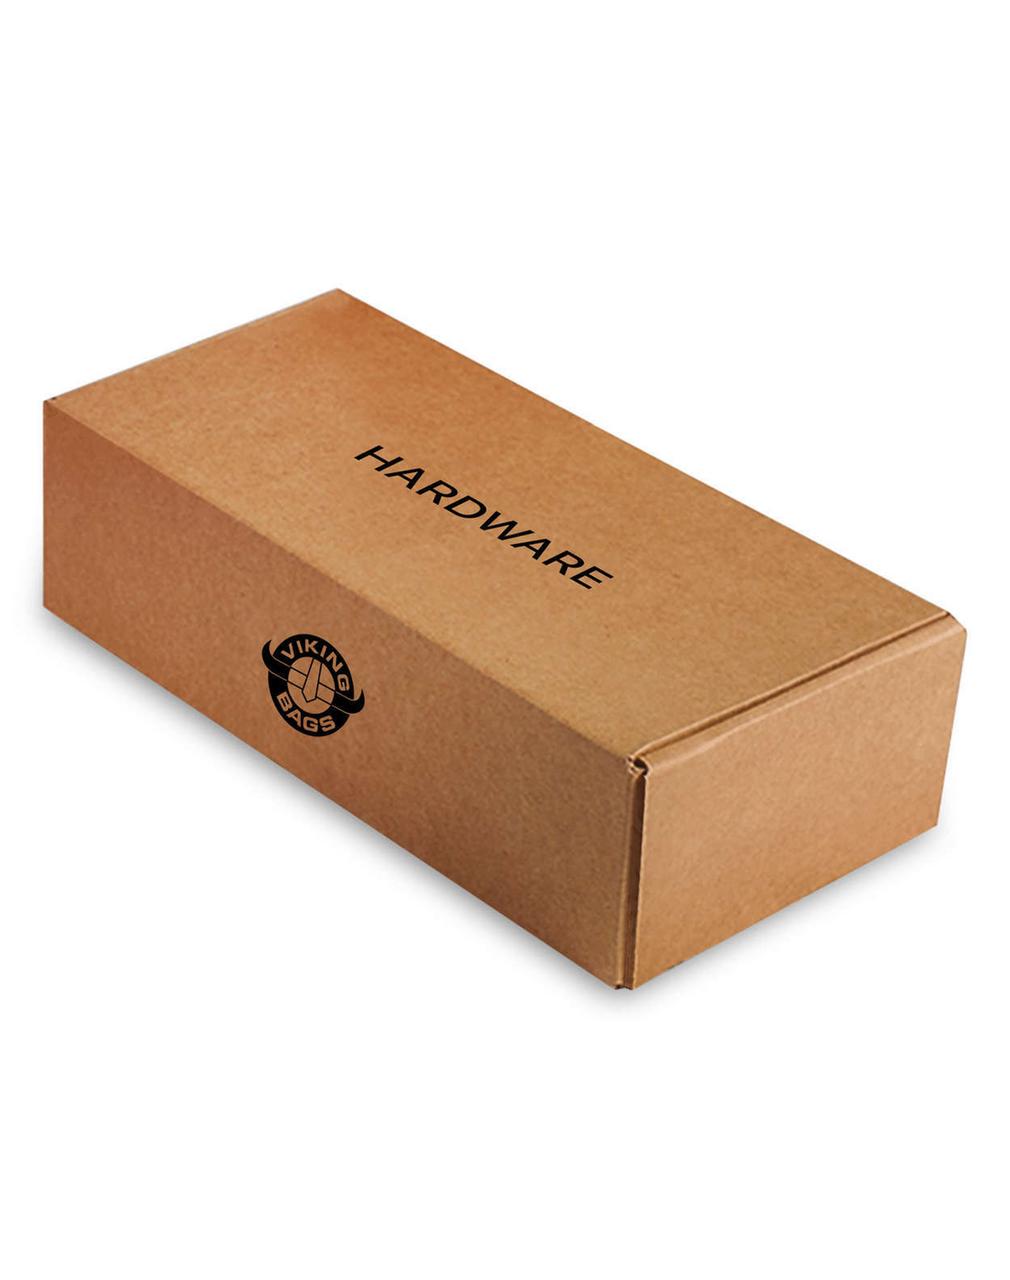 Boulevard C90, VL1500 Medium Slanted Studded Bags Hardware Box